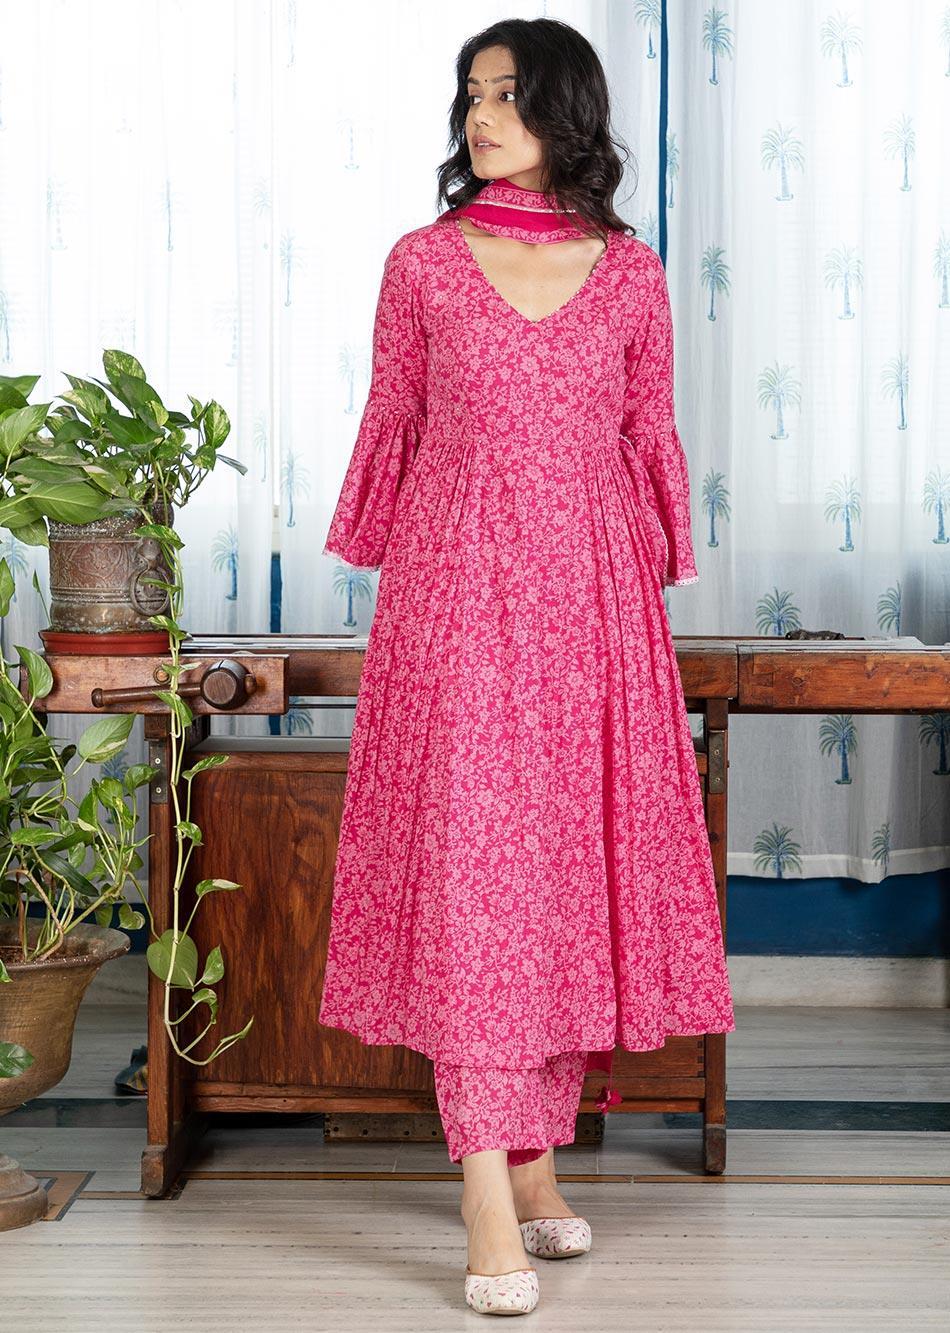 MOH Pink Anarkali Kurta (only kurta)